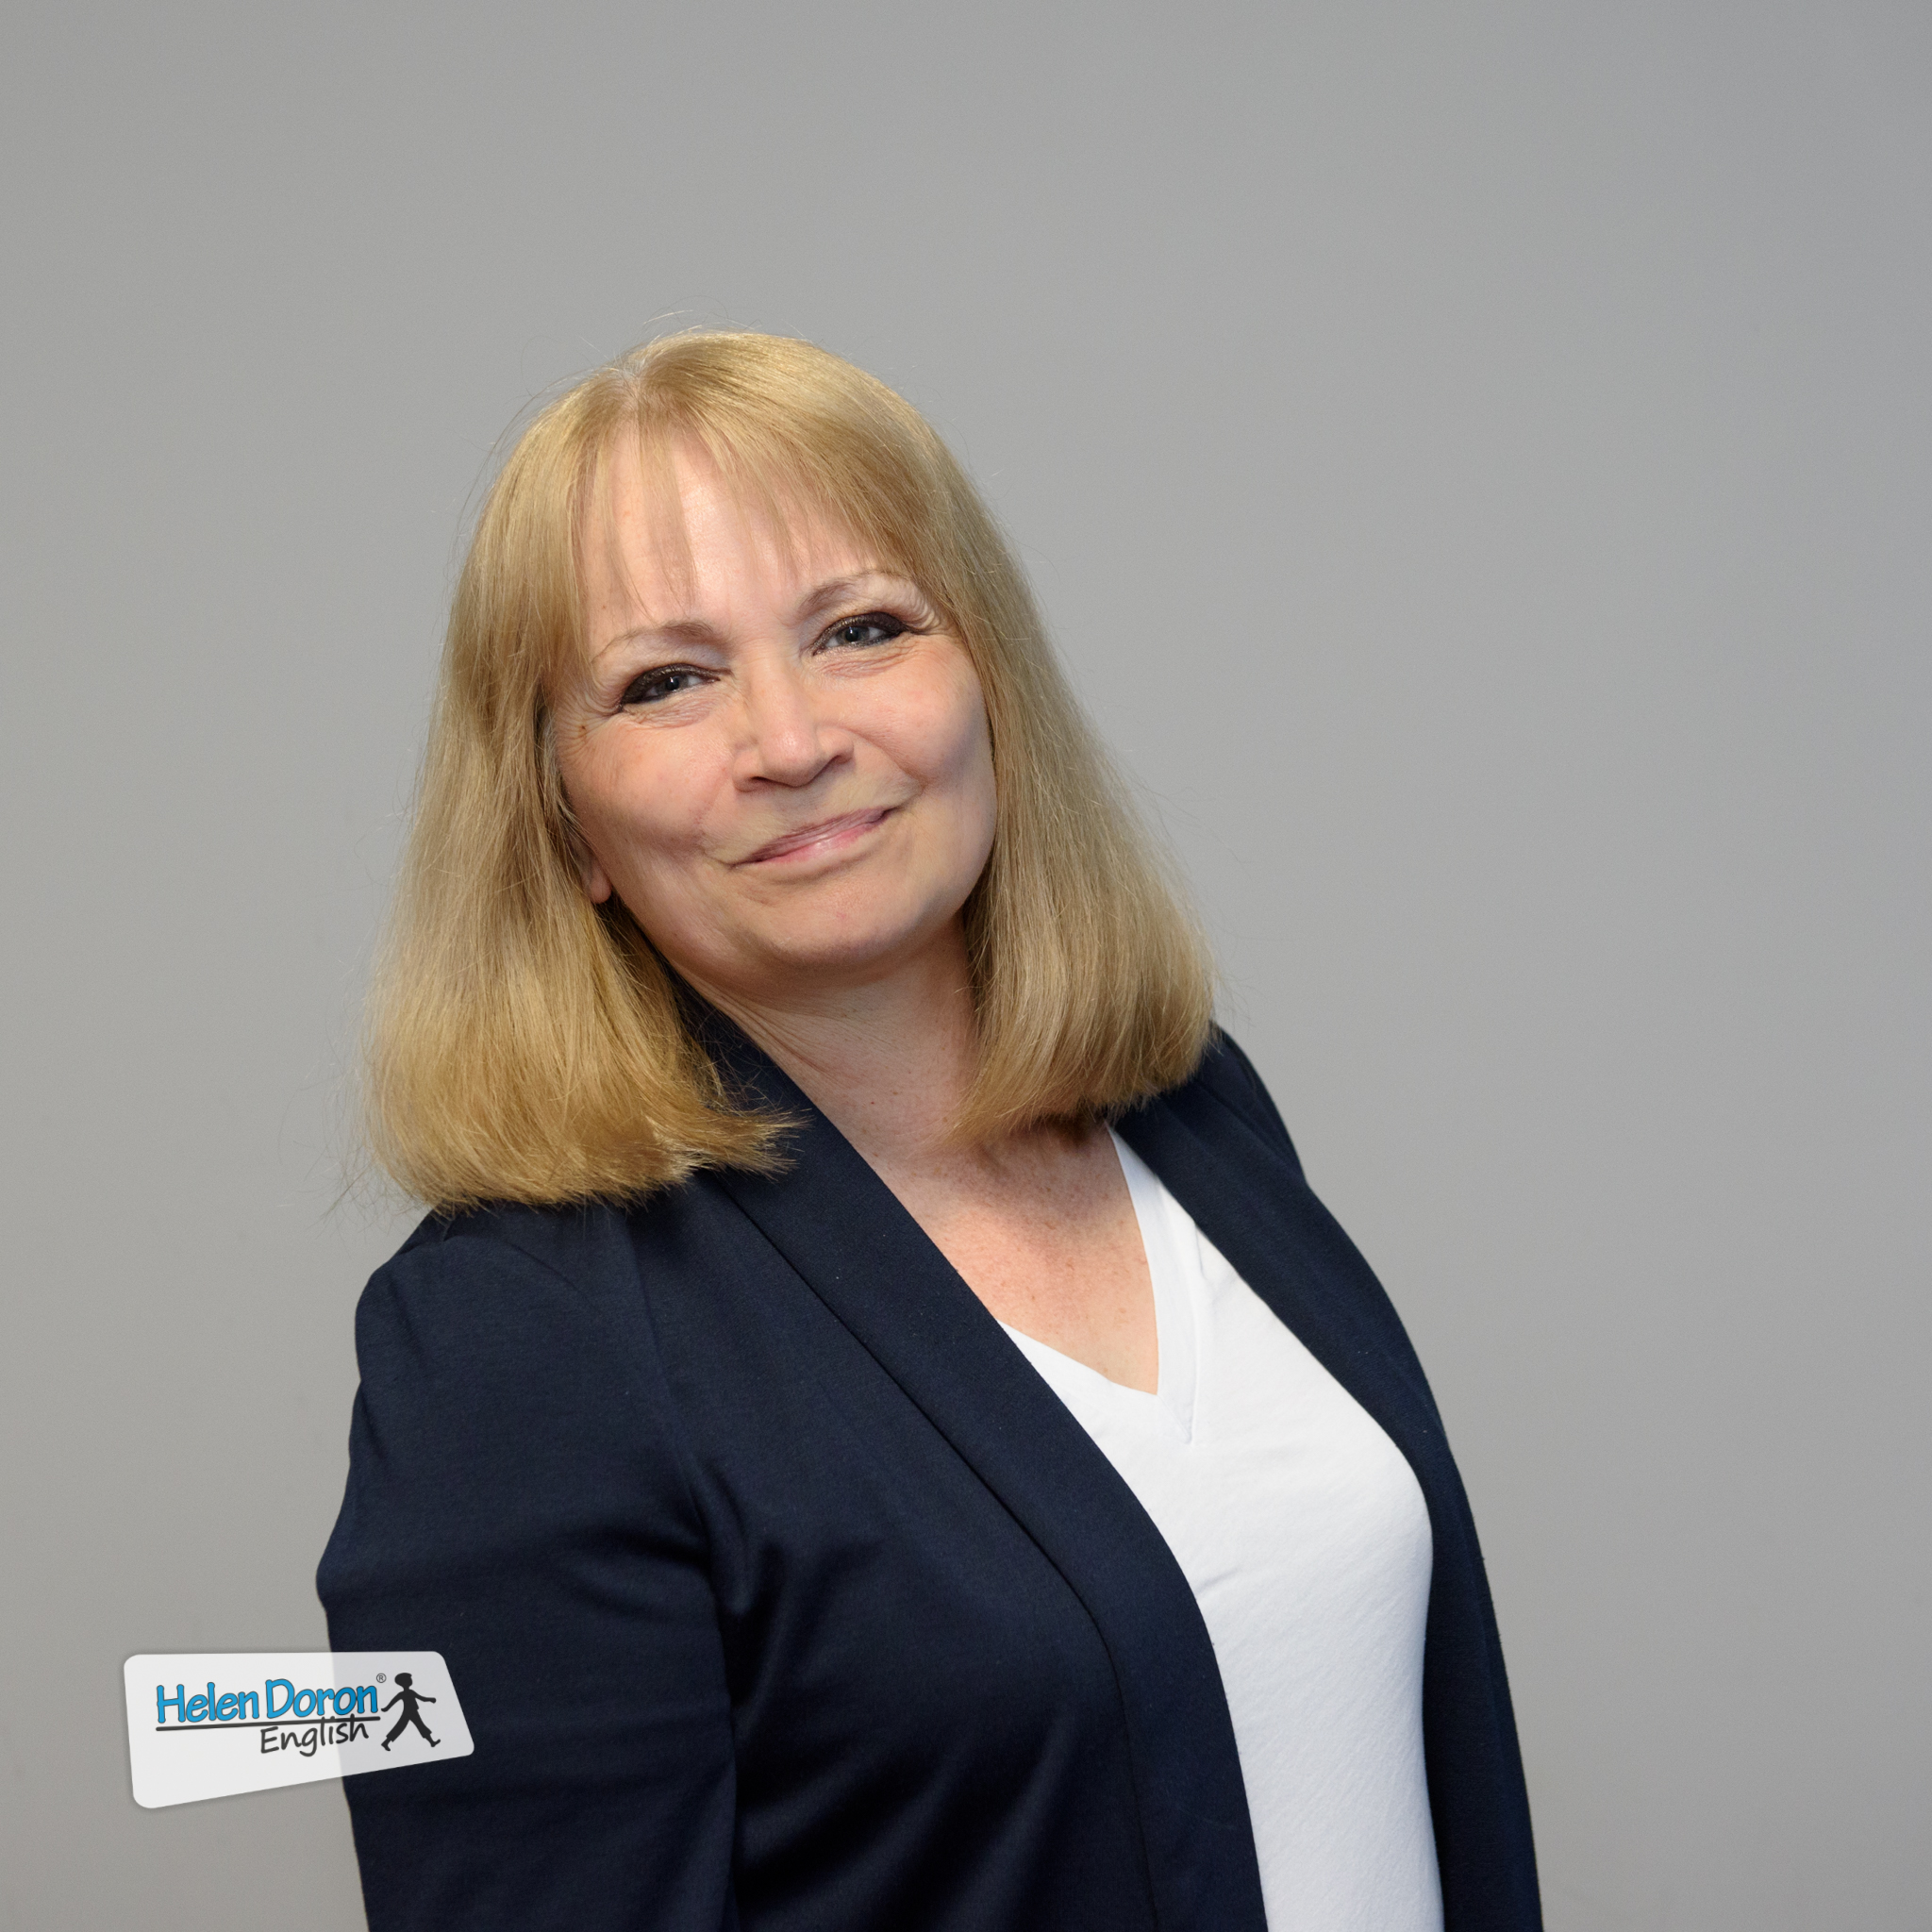 Moja droga z Helen Doron – Jolanta Frączkowska, Opole